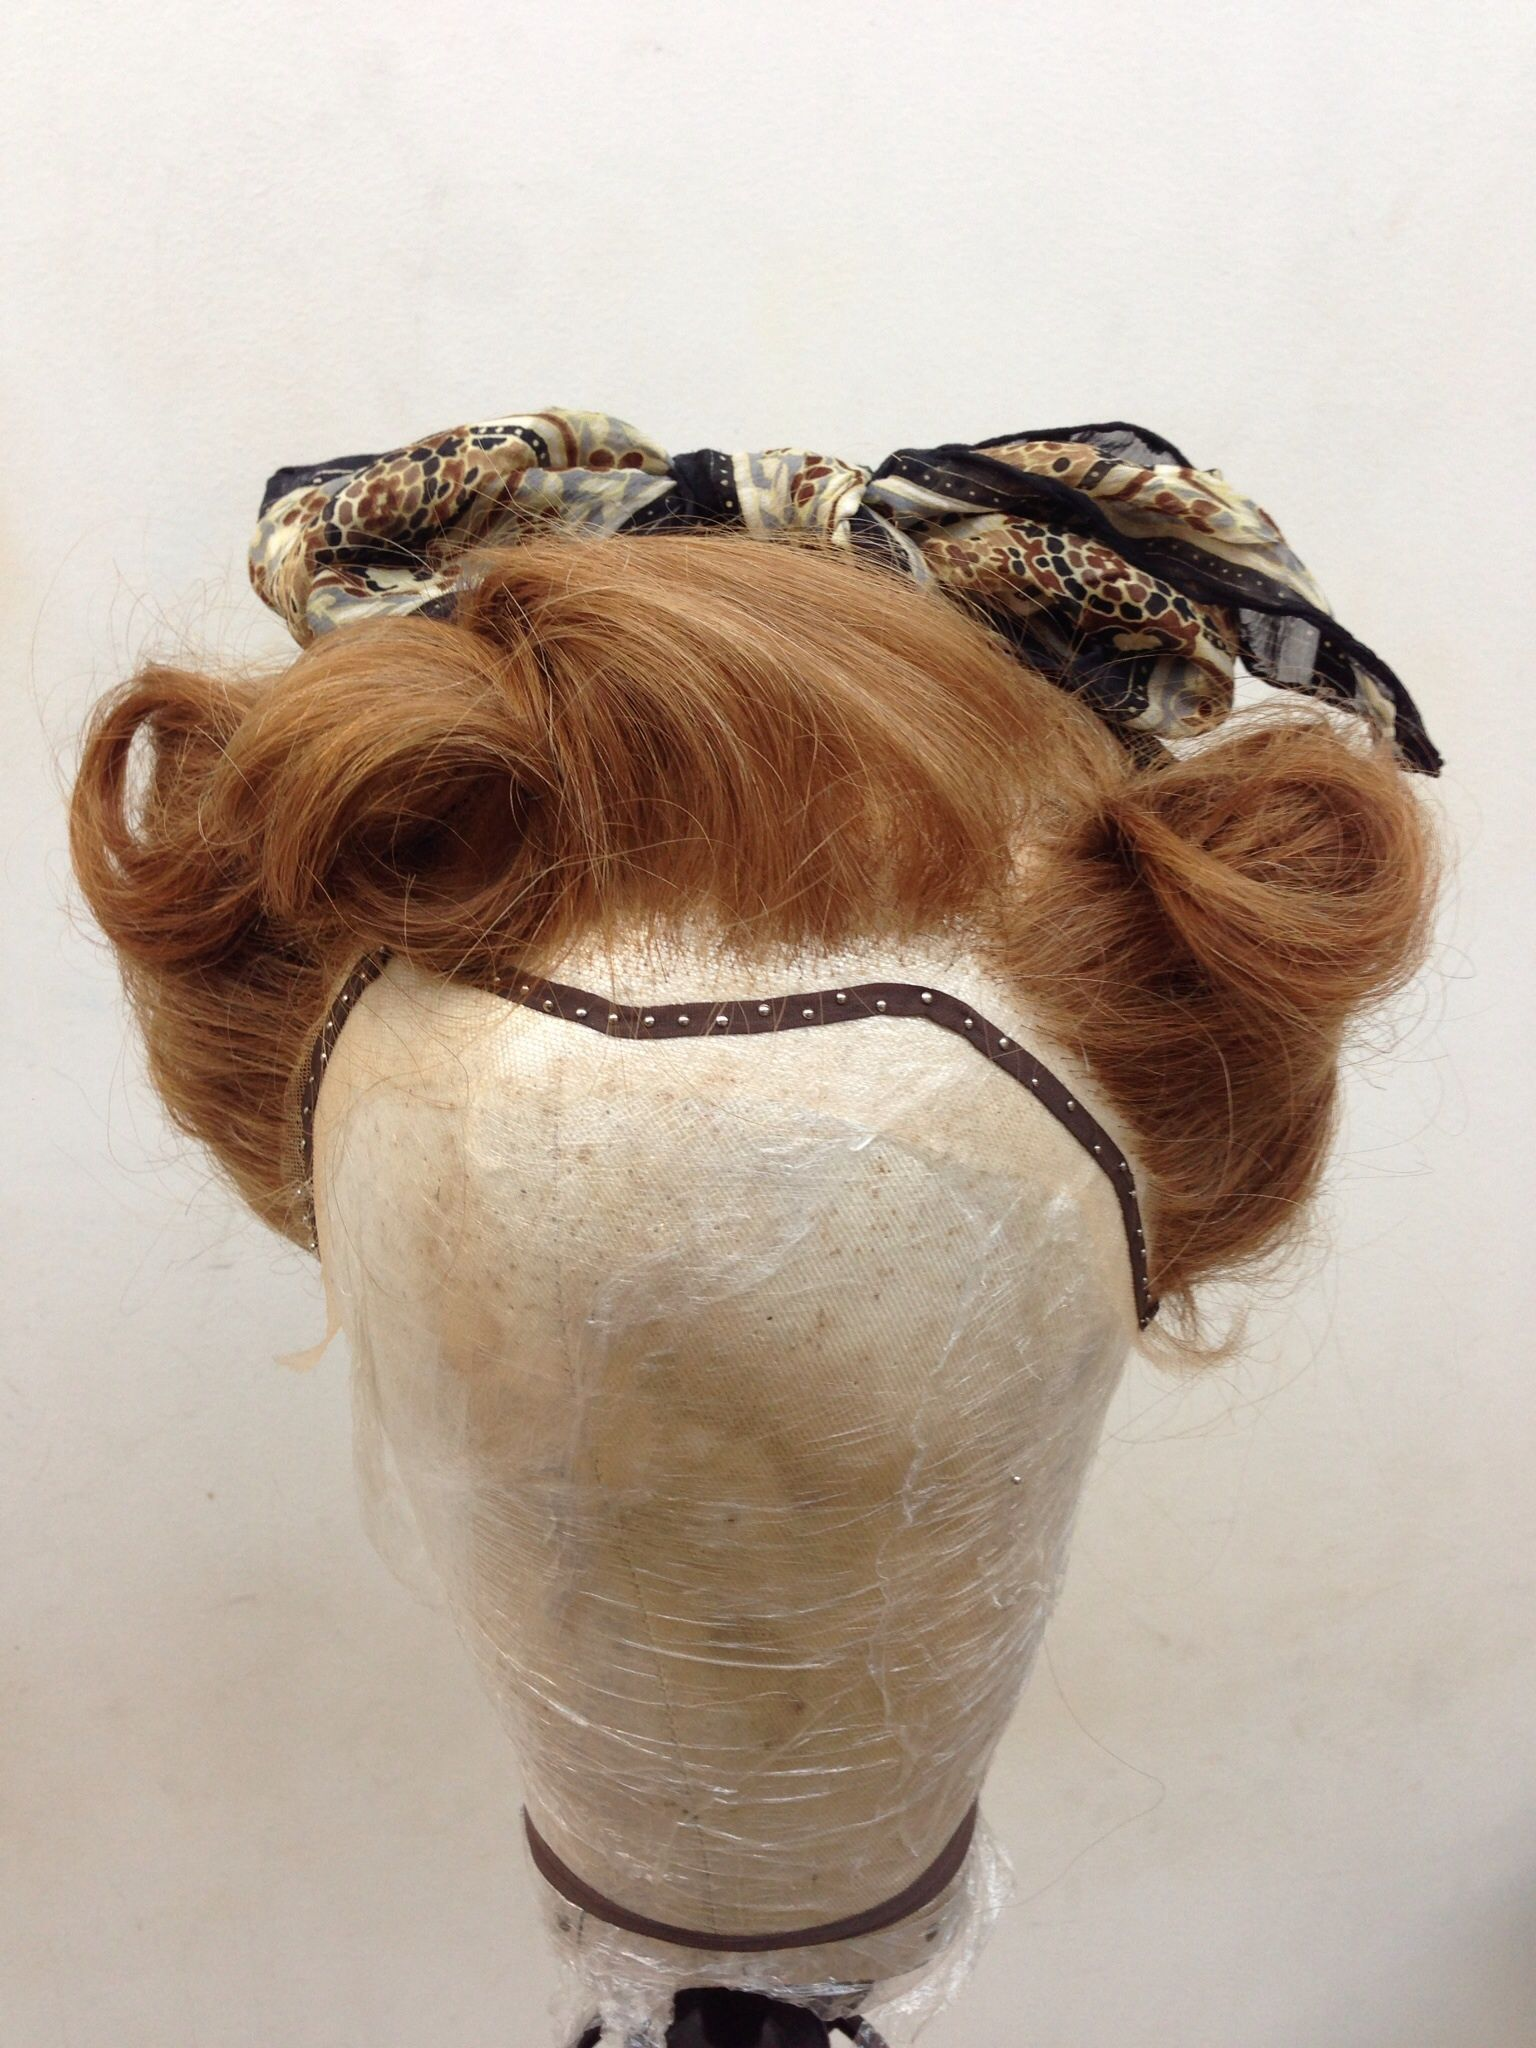 Period Wigs 1940's Land Girls Vintage hairstyles, Hair